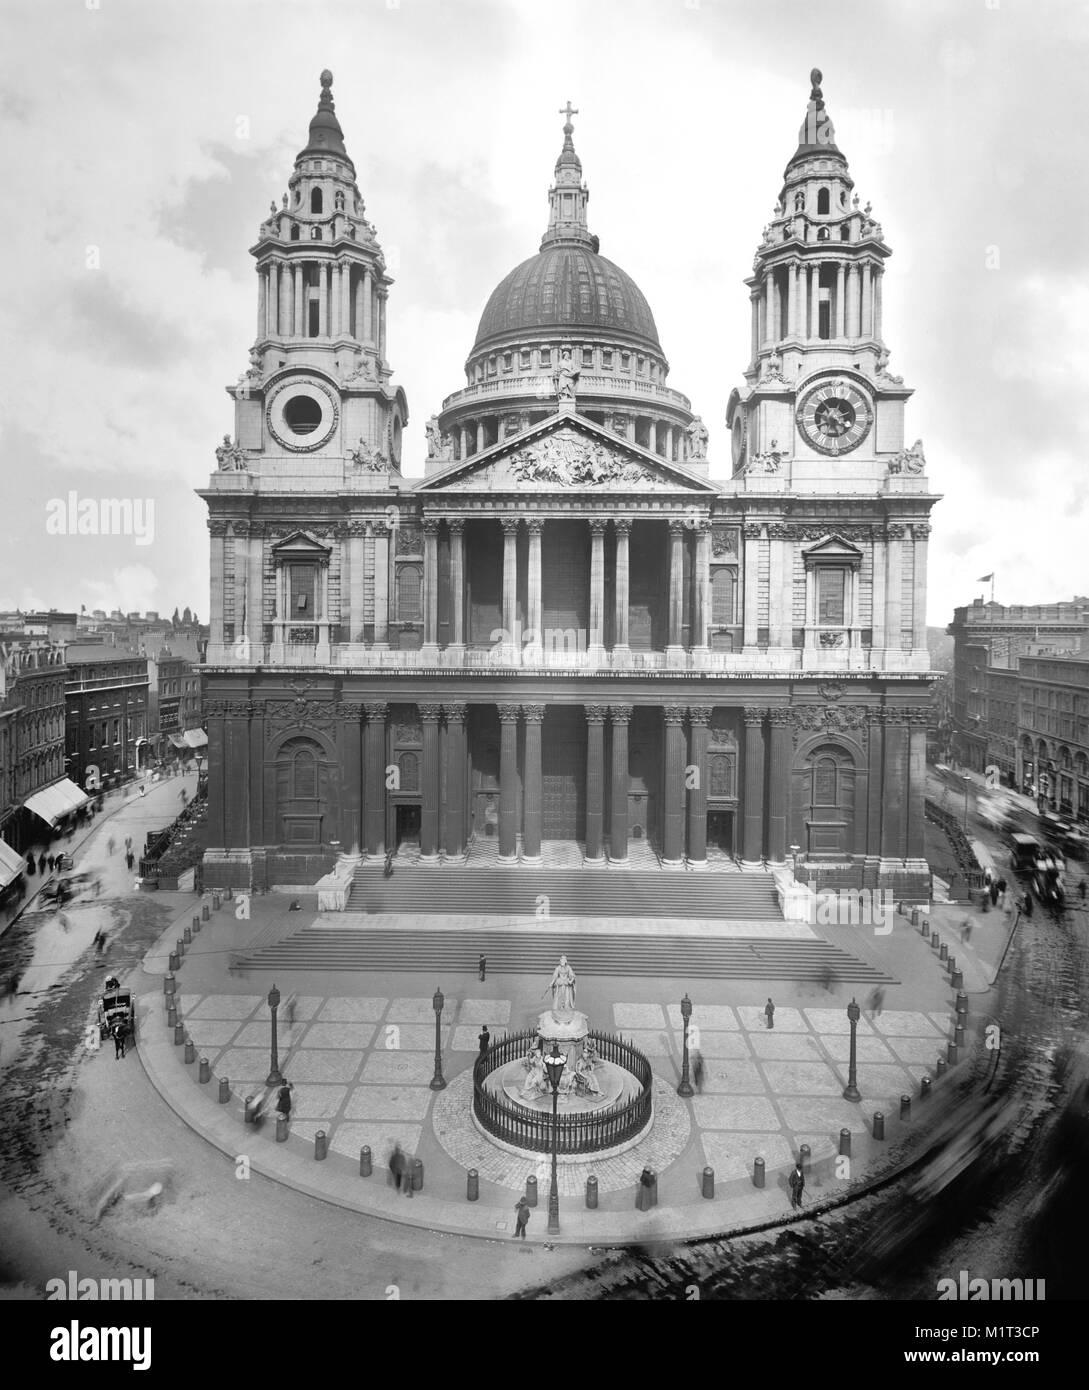 Saint Paul's Cathedral, London, England, UK, Detroit Publishing Company, early 1910's - Stock Image